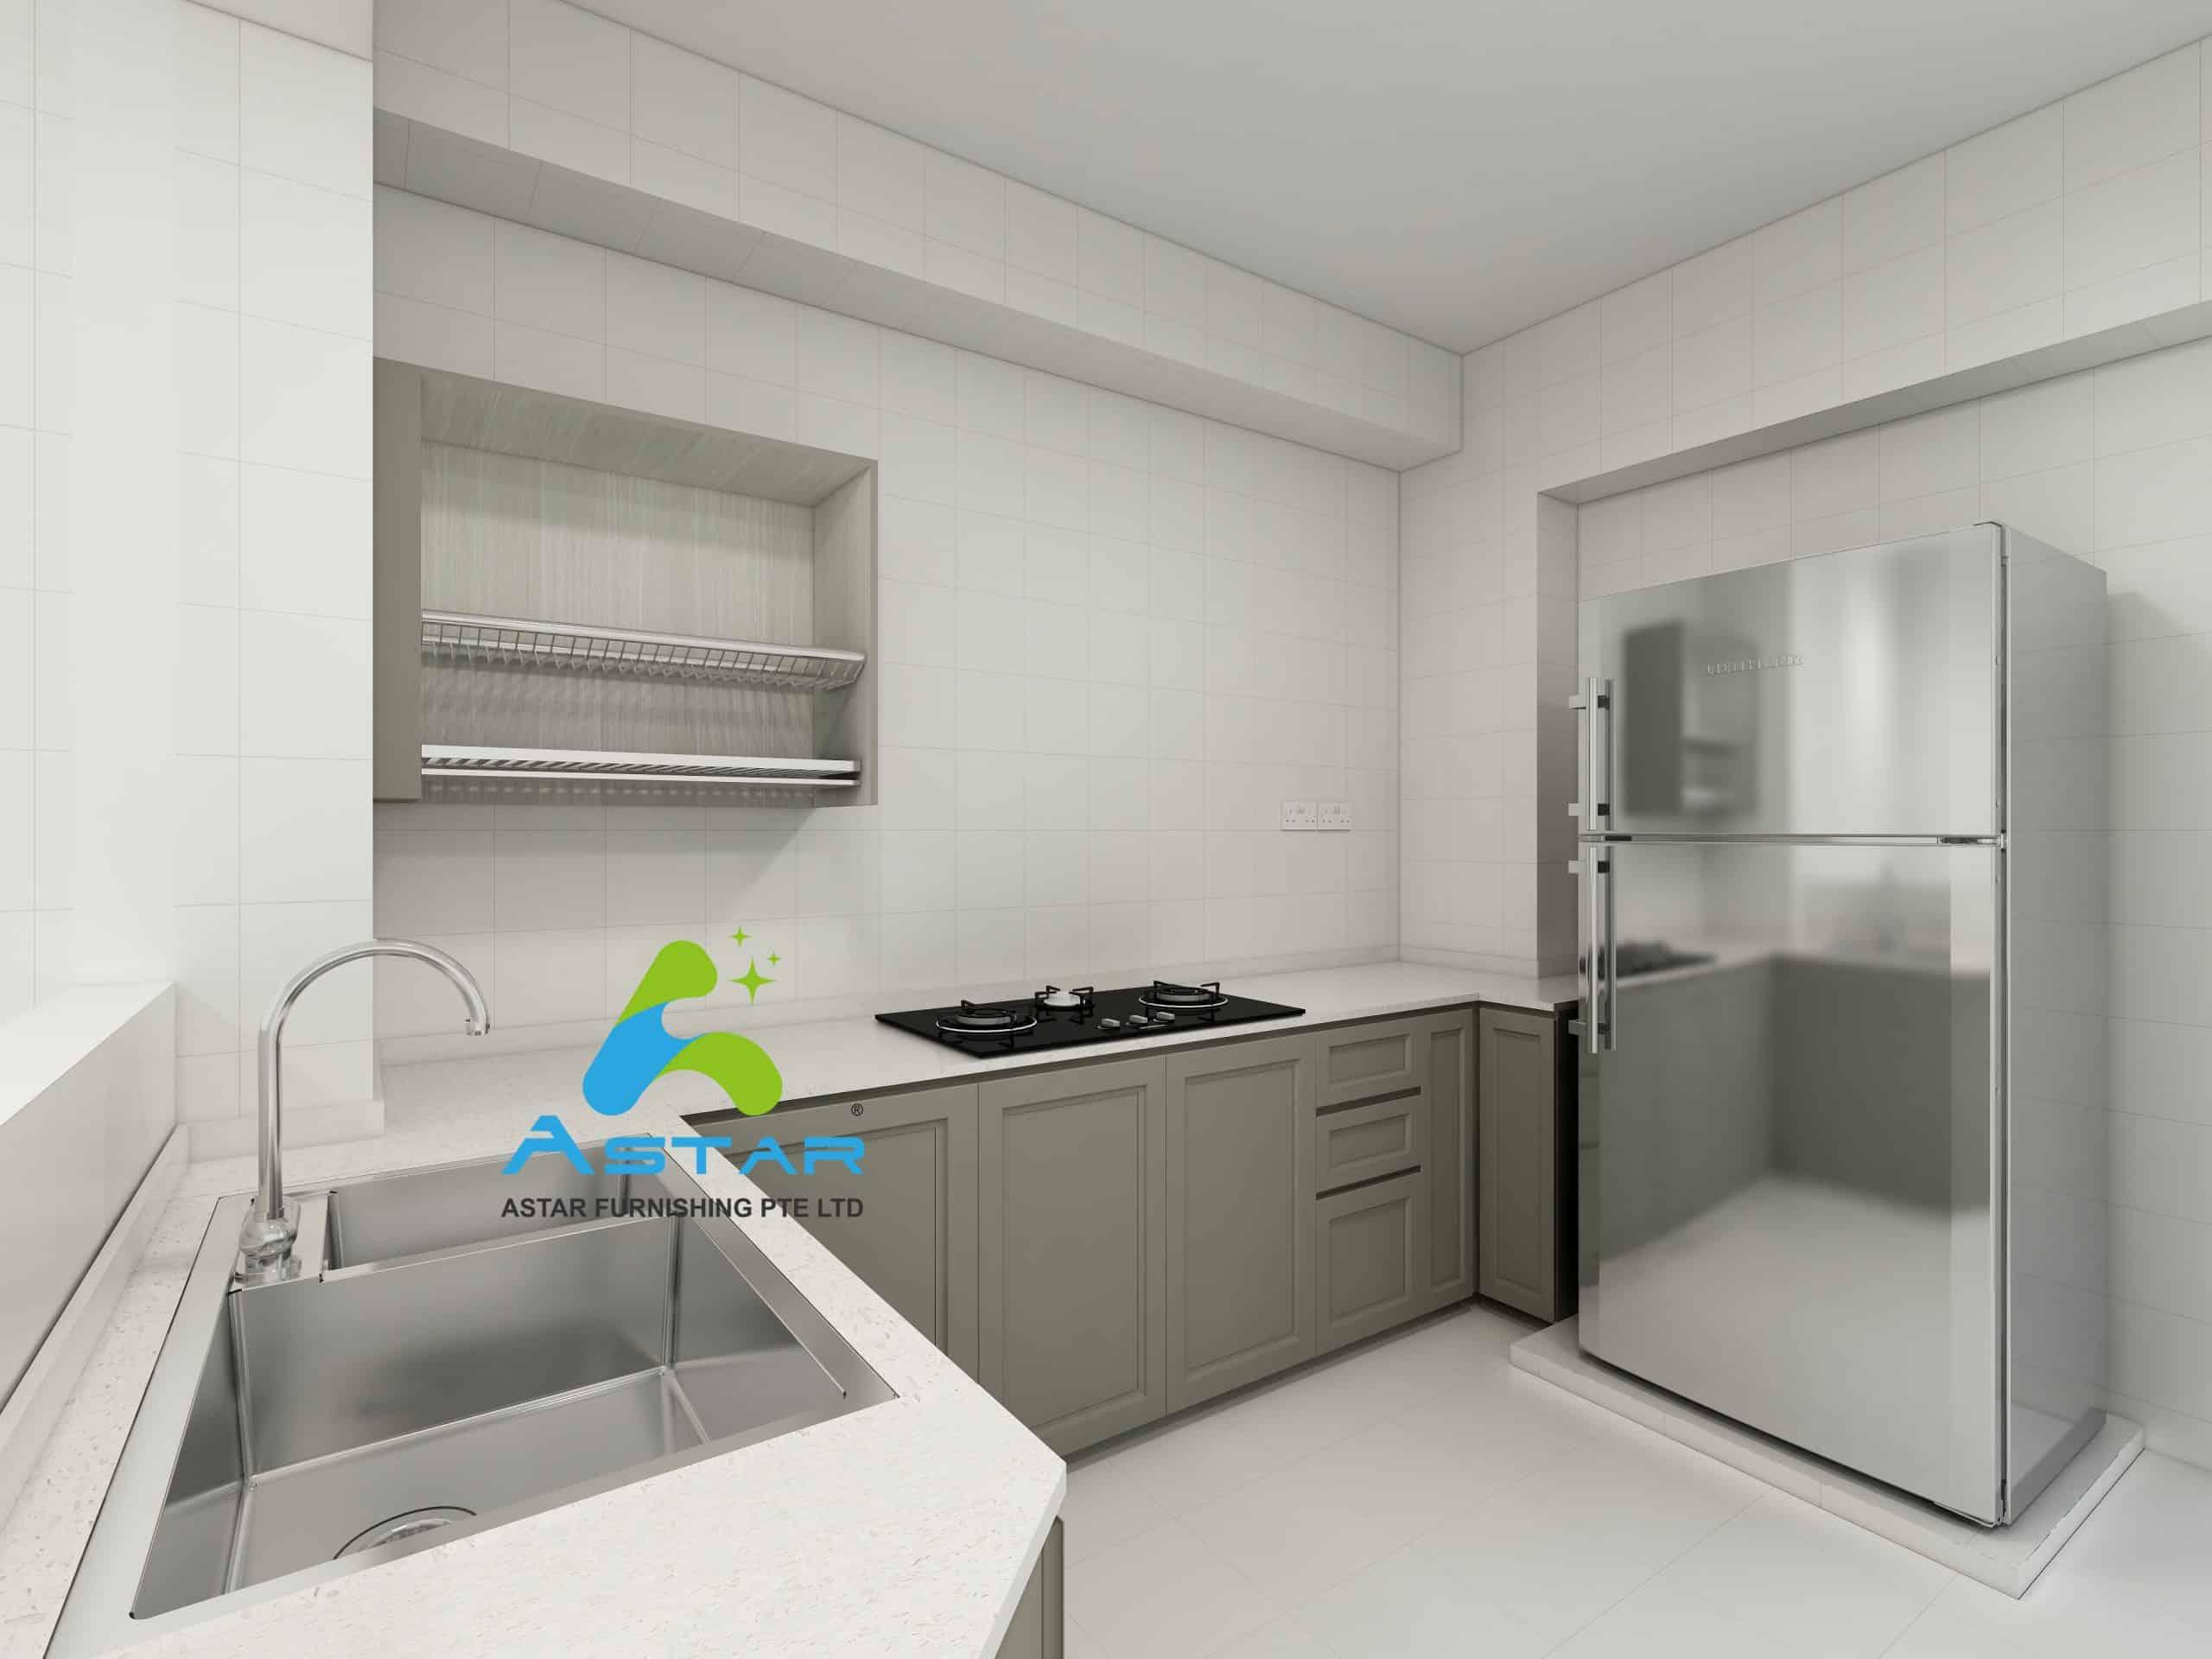 a star furnishing aluminium projects 17. Blk 679 Choa Chu Kang Crescent 037 scaled